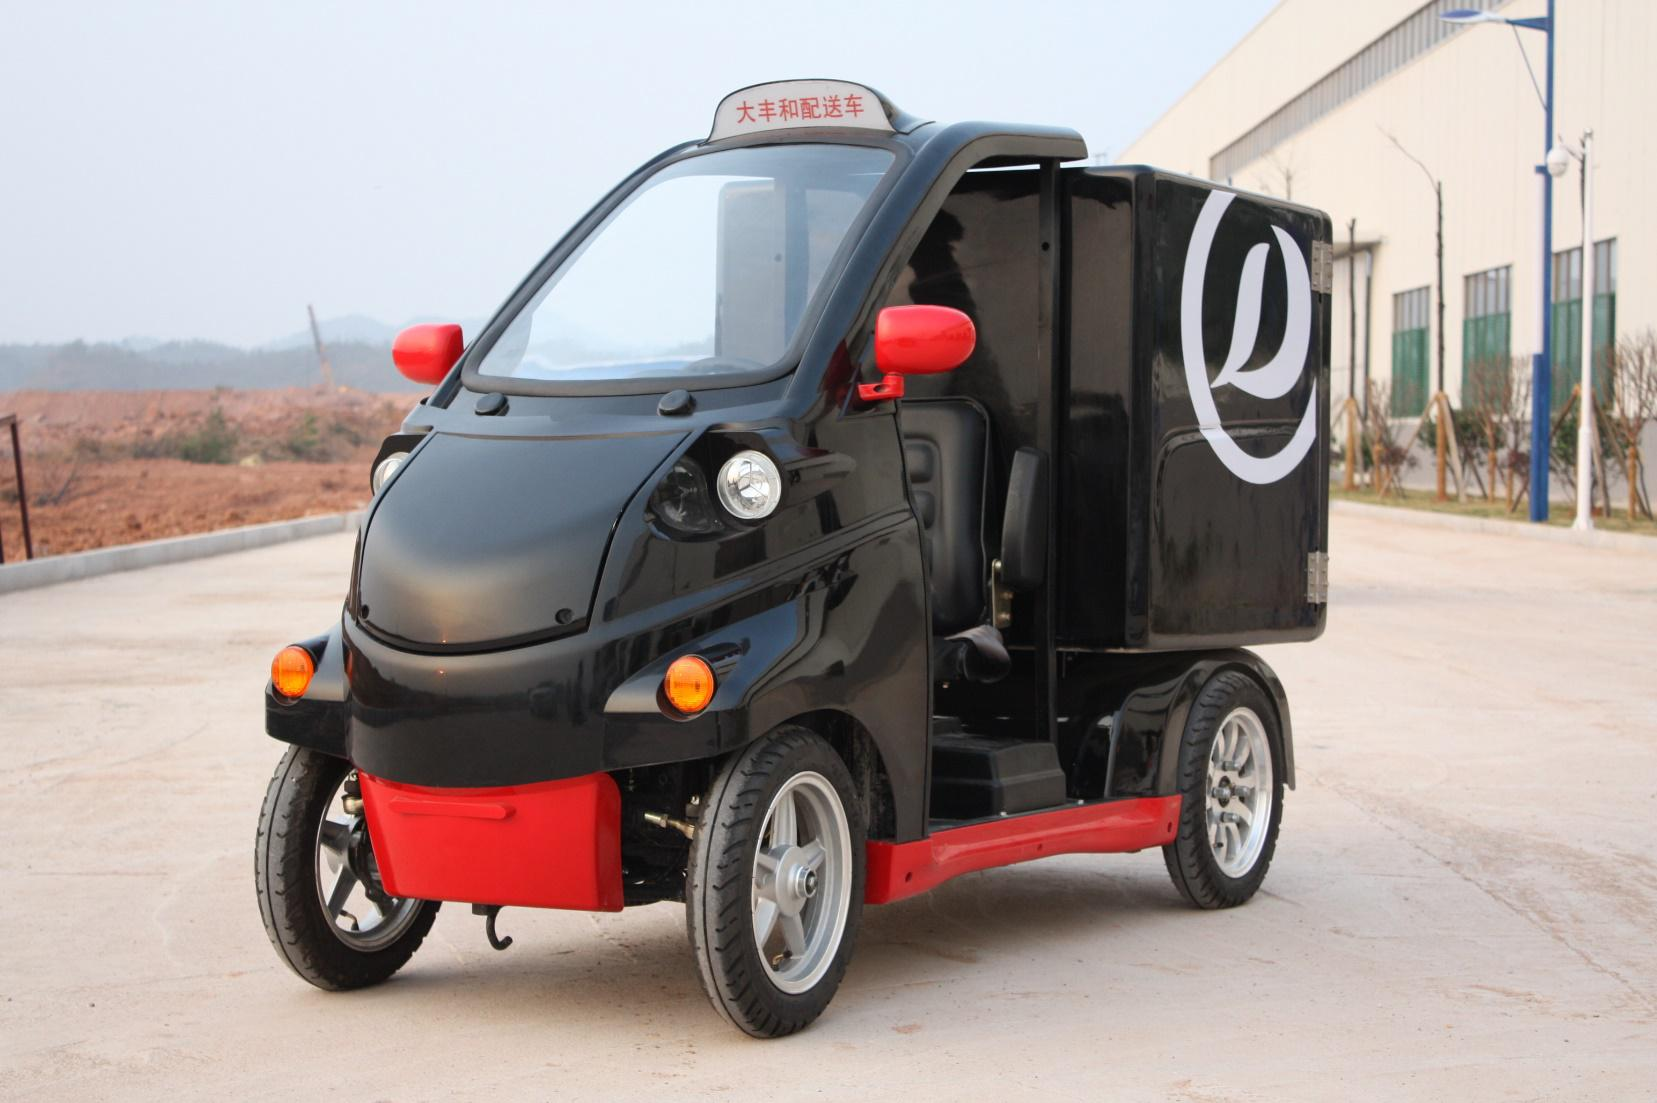 Hot Sale Chinese 2 Seats Low Price Mini Electric Car View Mini